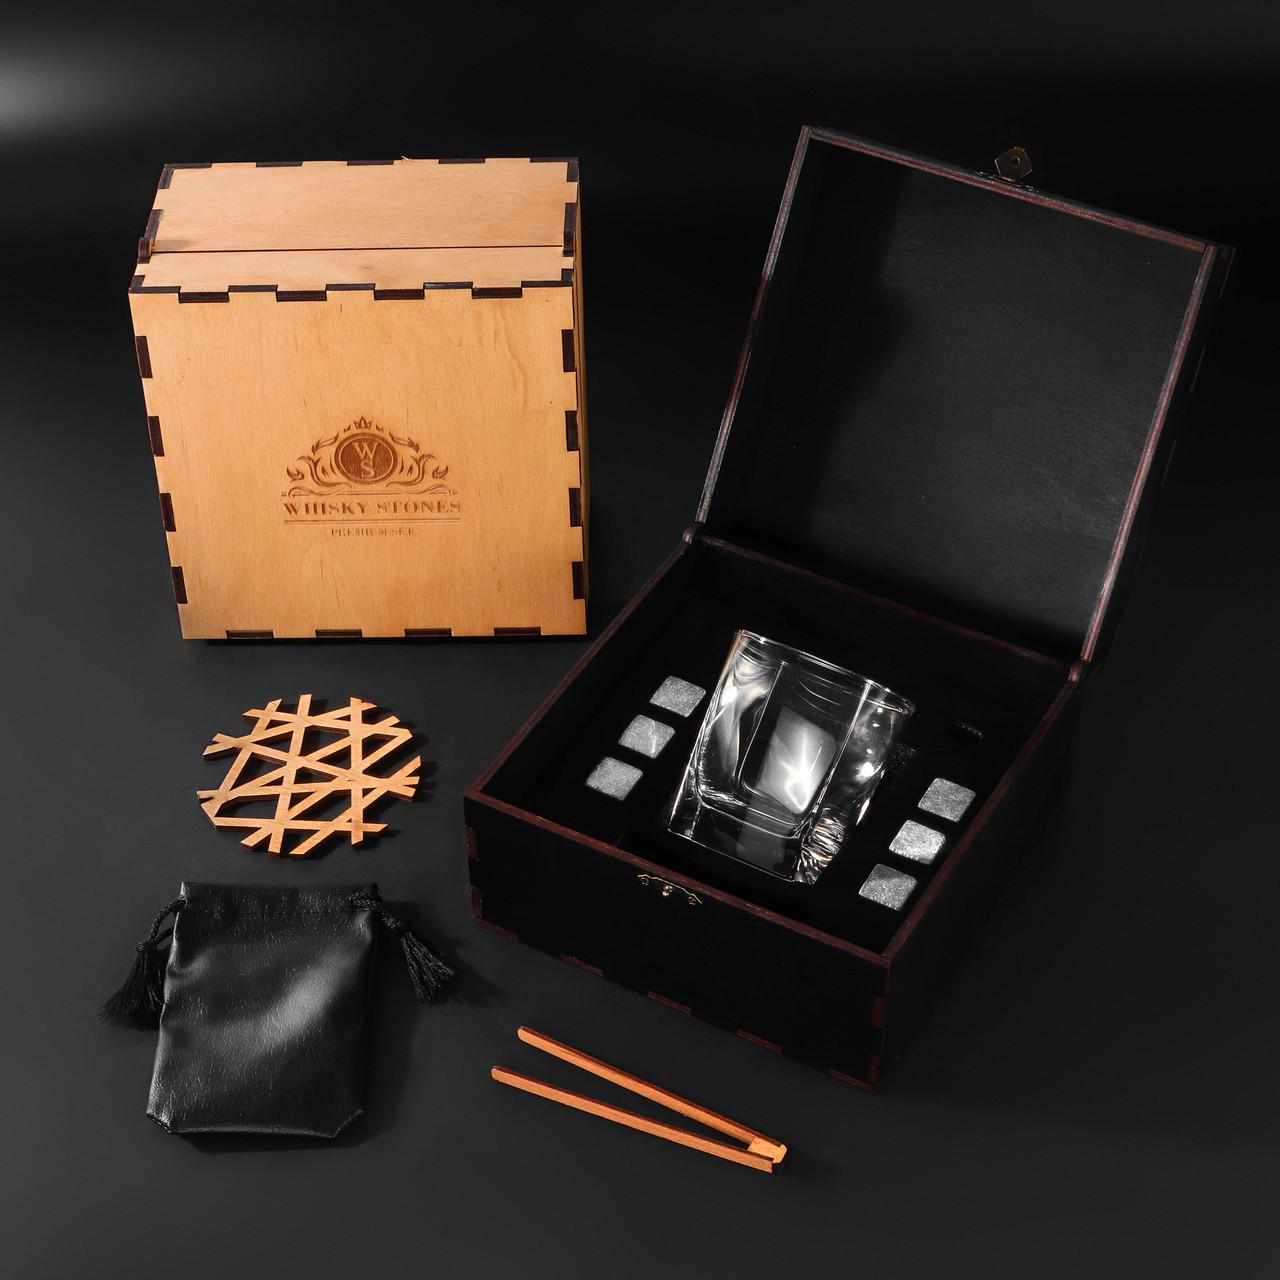 Камни для виски. Подарок мужу. Камни для виски подарочный деревянный набор с бокалом Bohemia